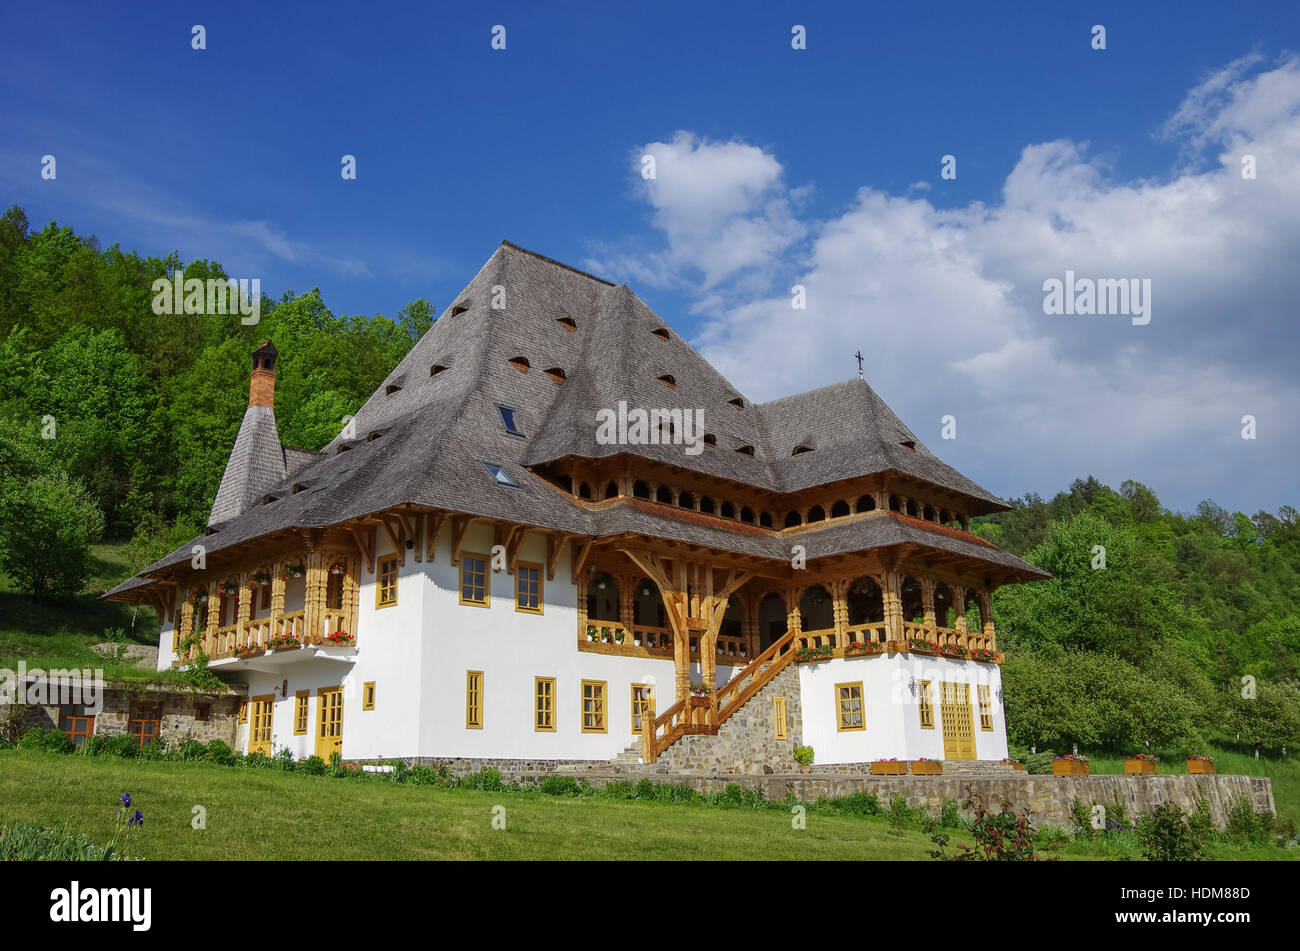 Europe Romania Maramures Wooden Church Stockfotos Europe Romania Maramures Wooden Church